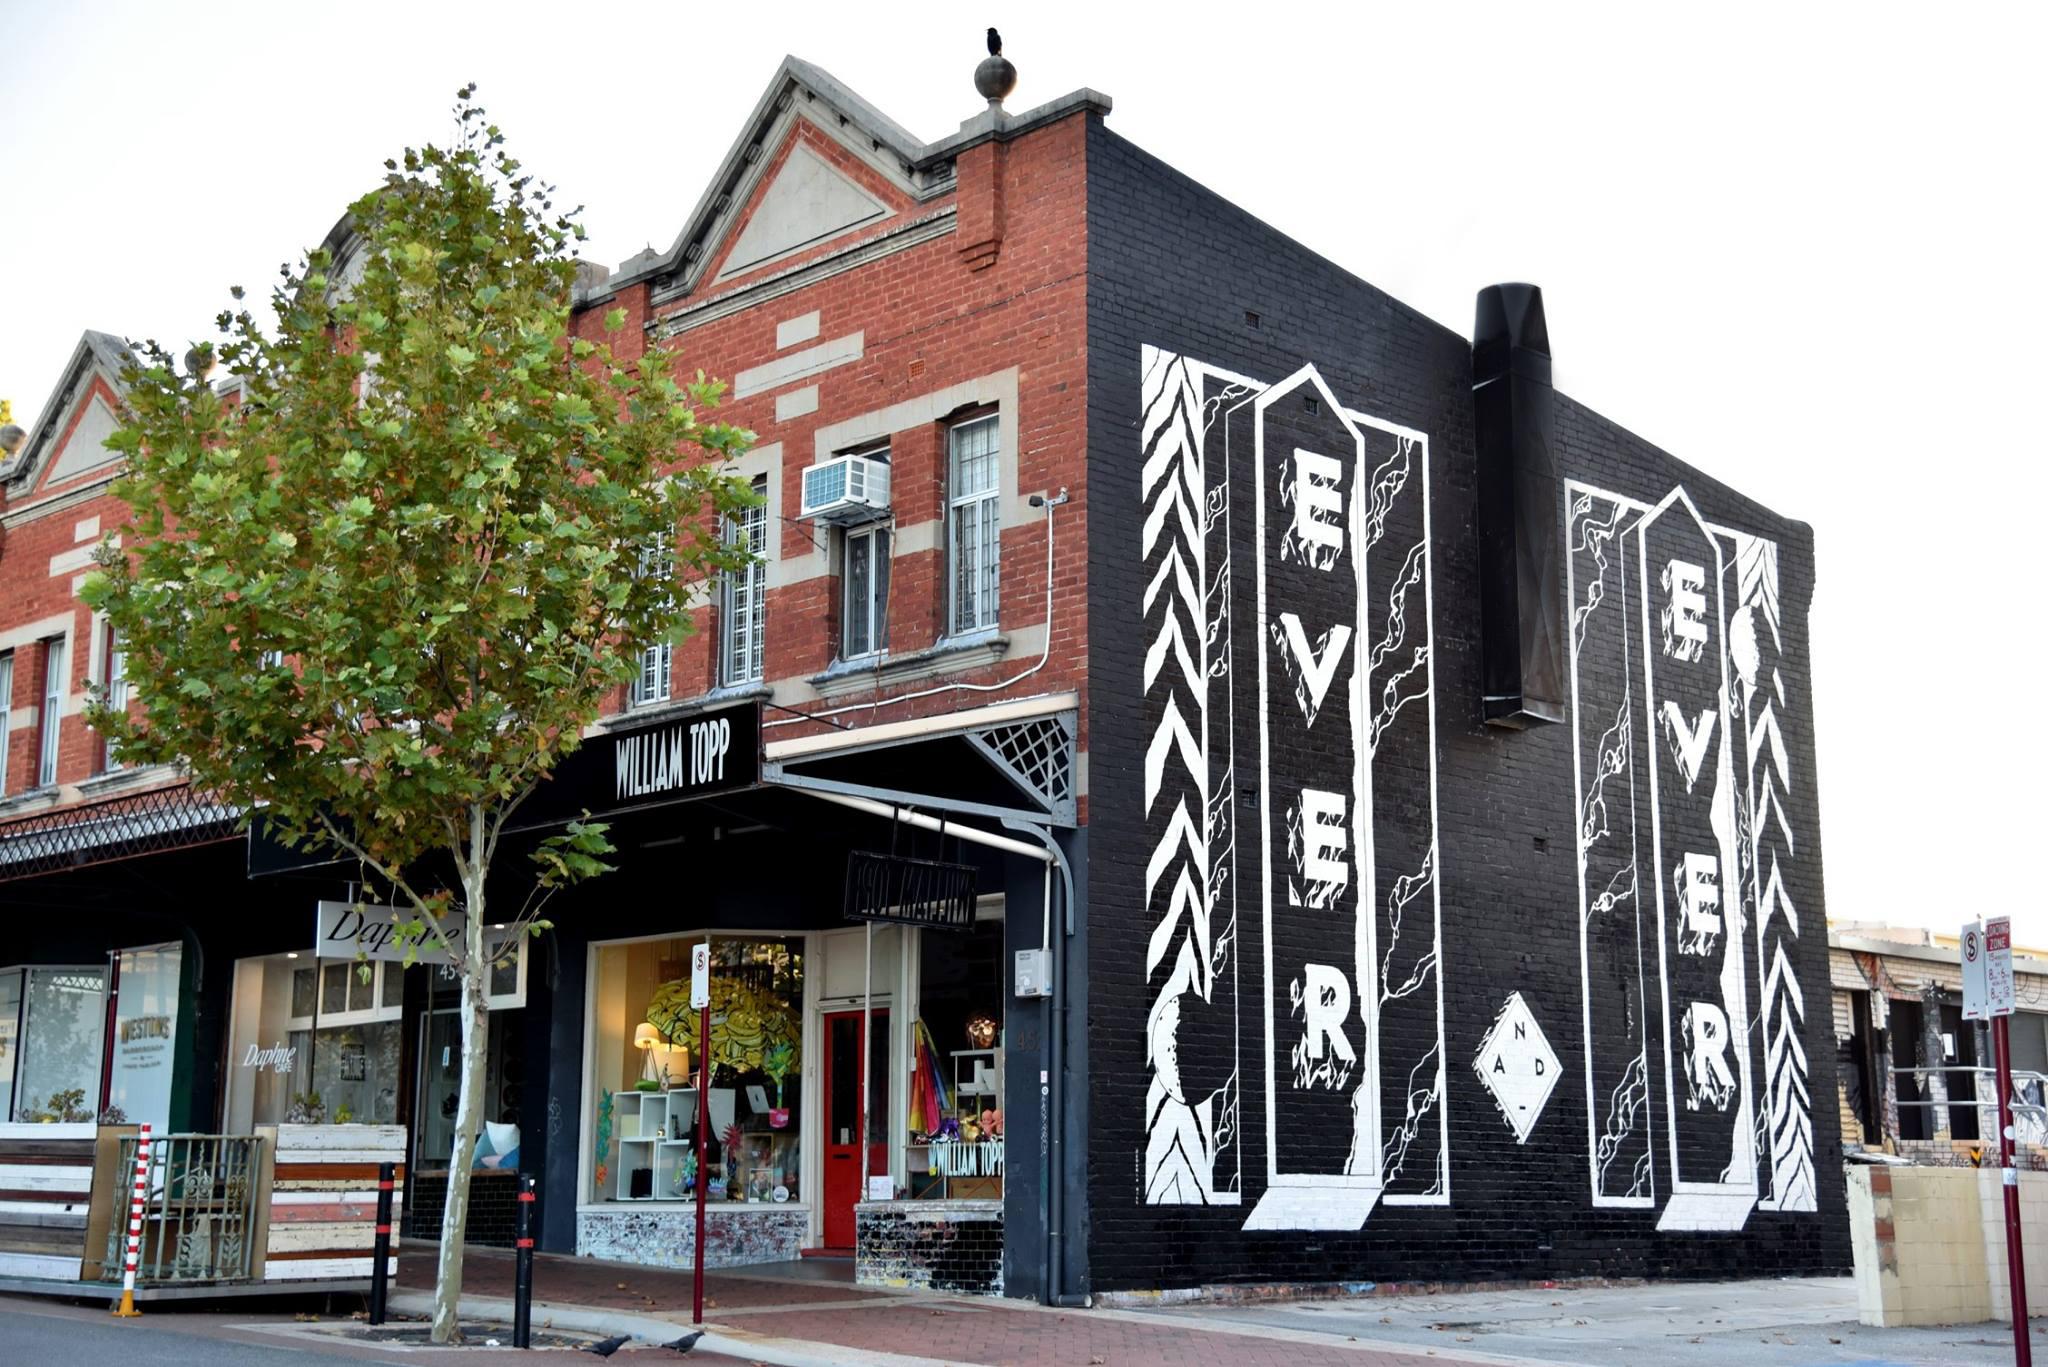 Georgia Hill_Streetside Perth_Sherrie Wilson Projects.jpg